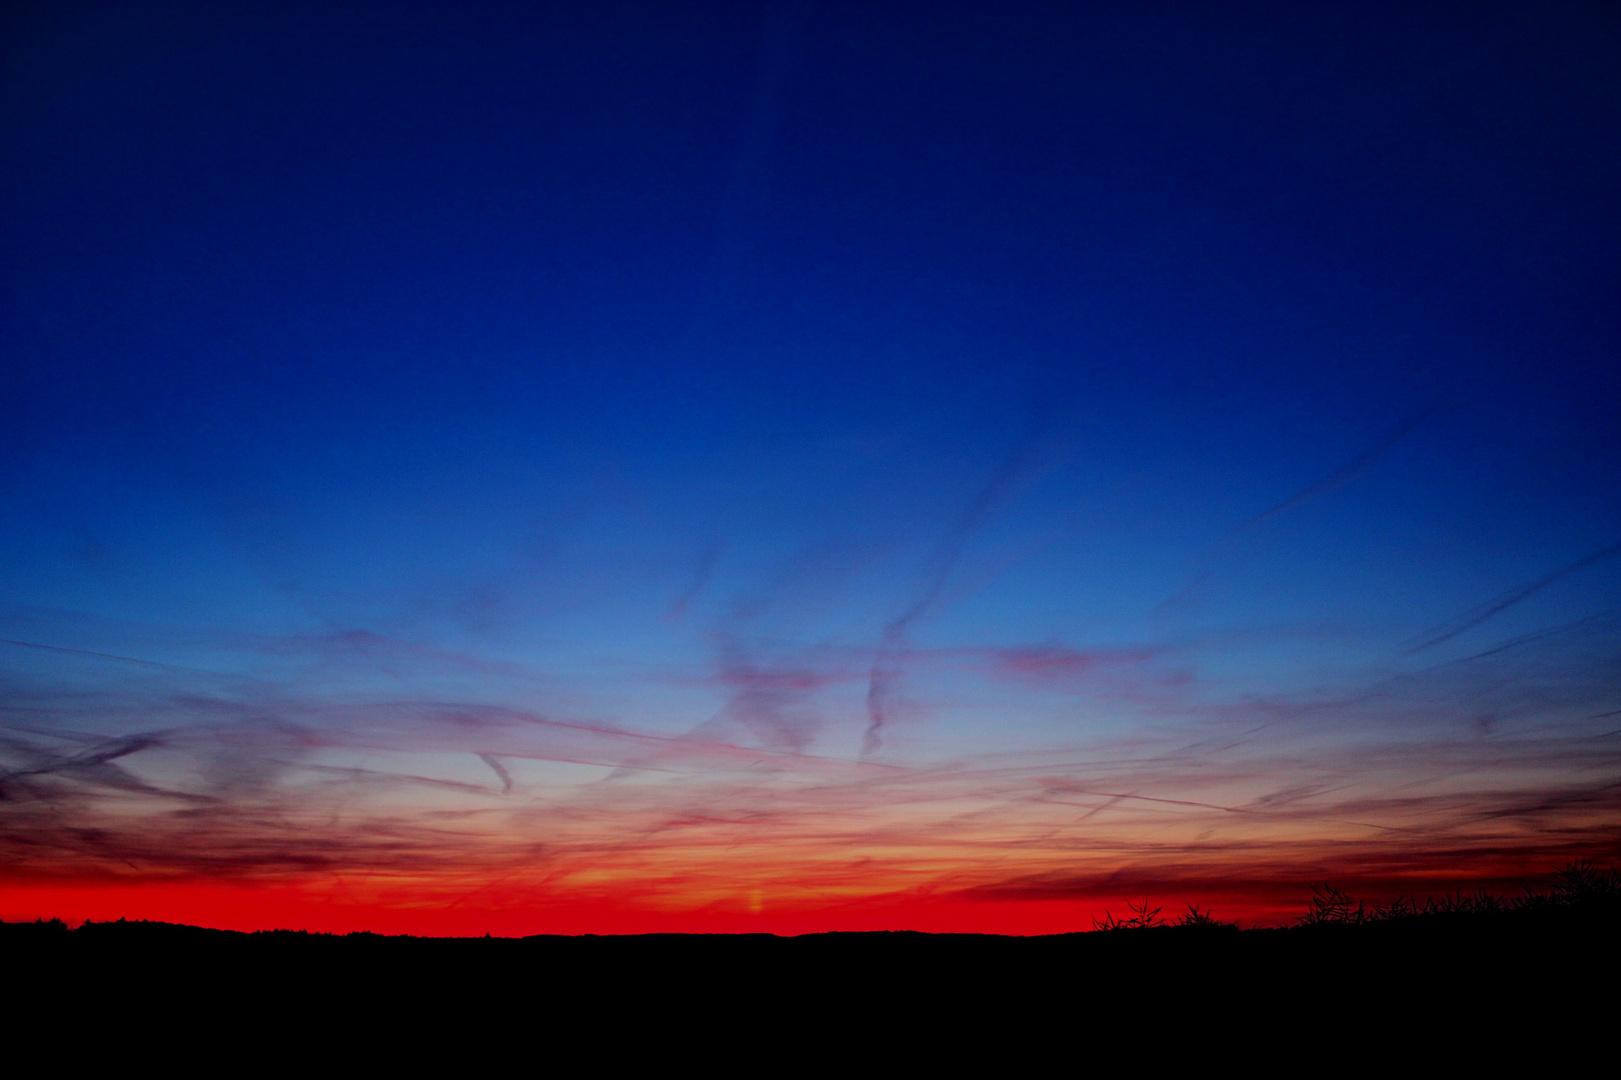 Sonnenuntergang in rot und blau.